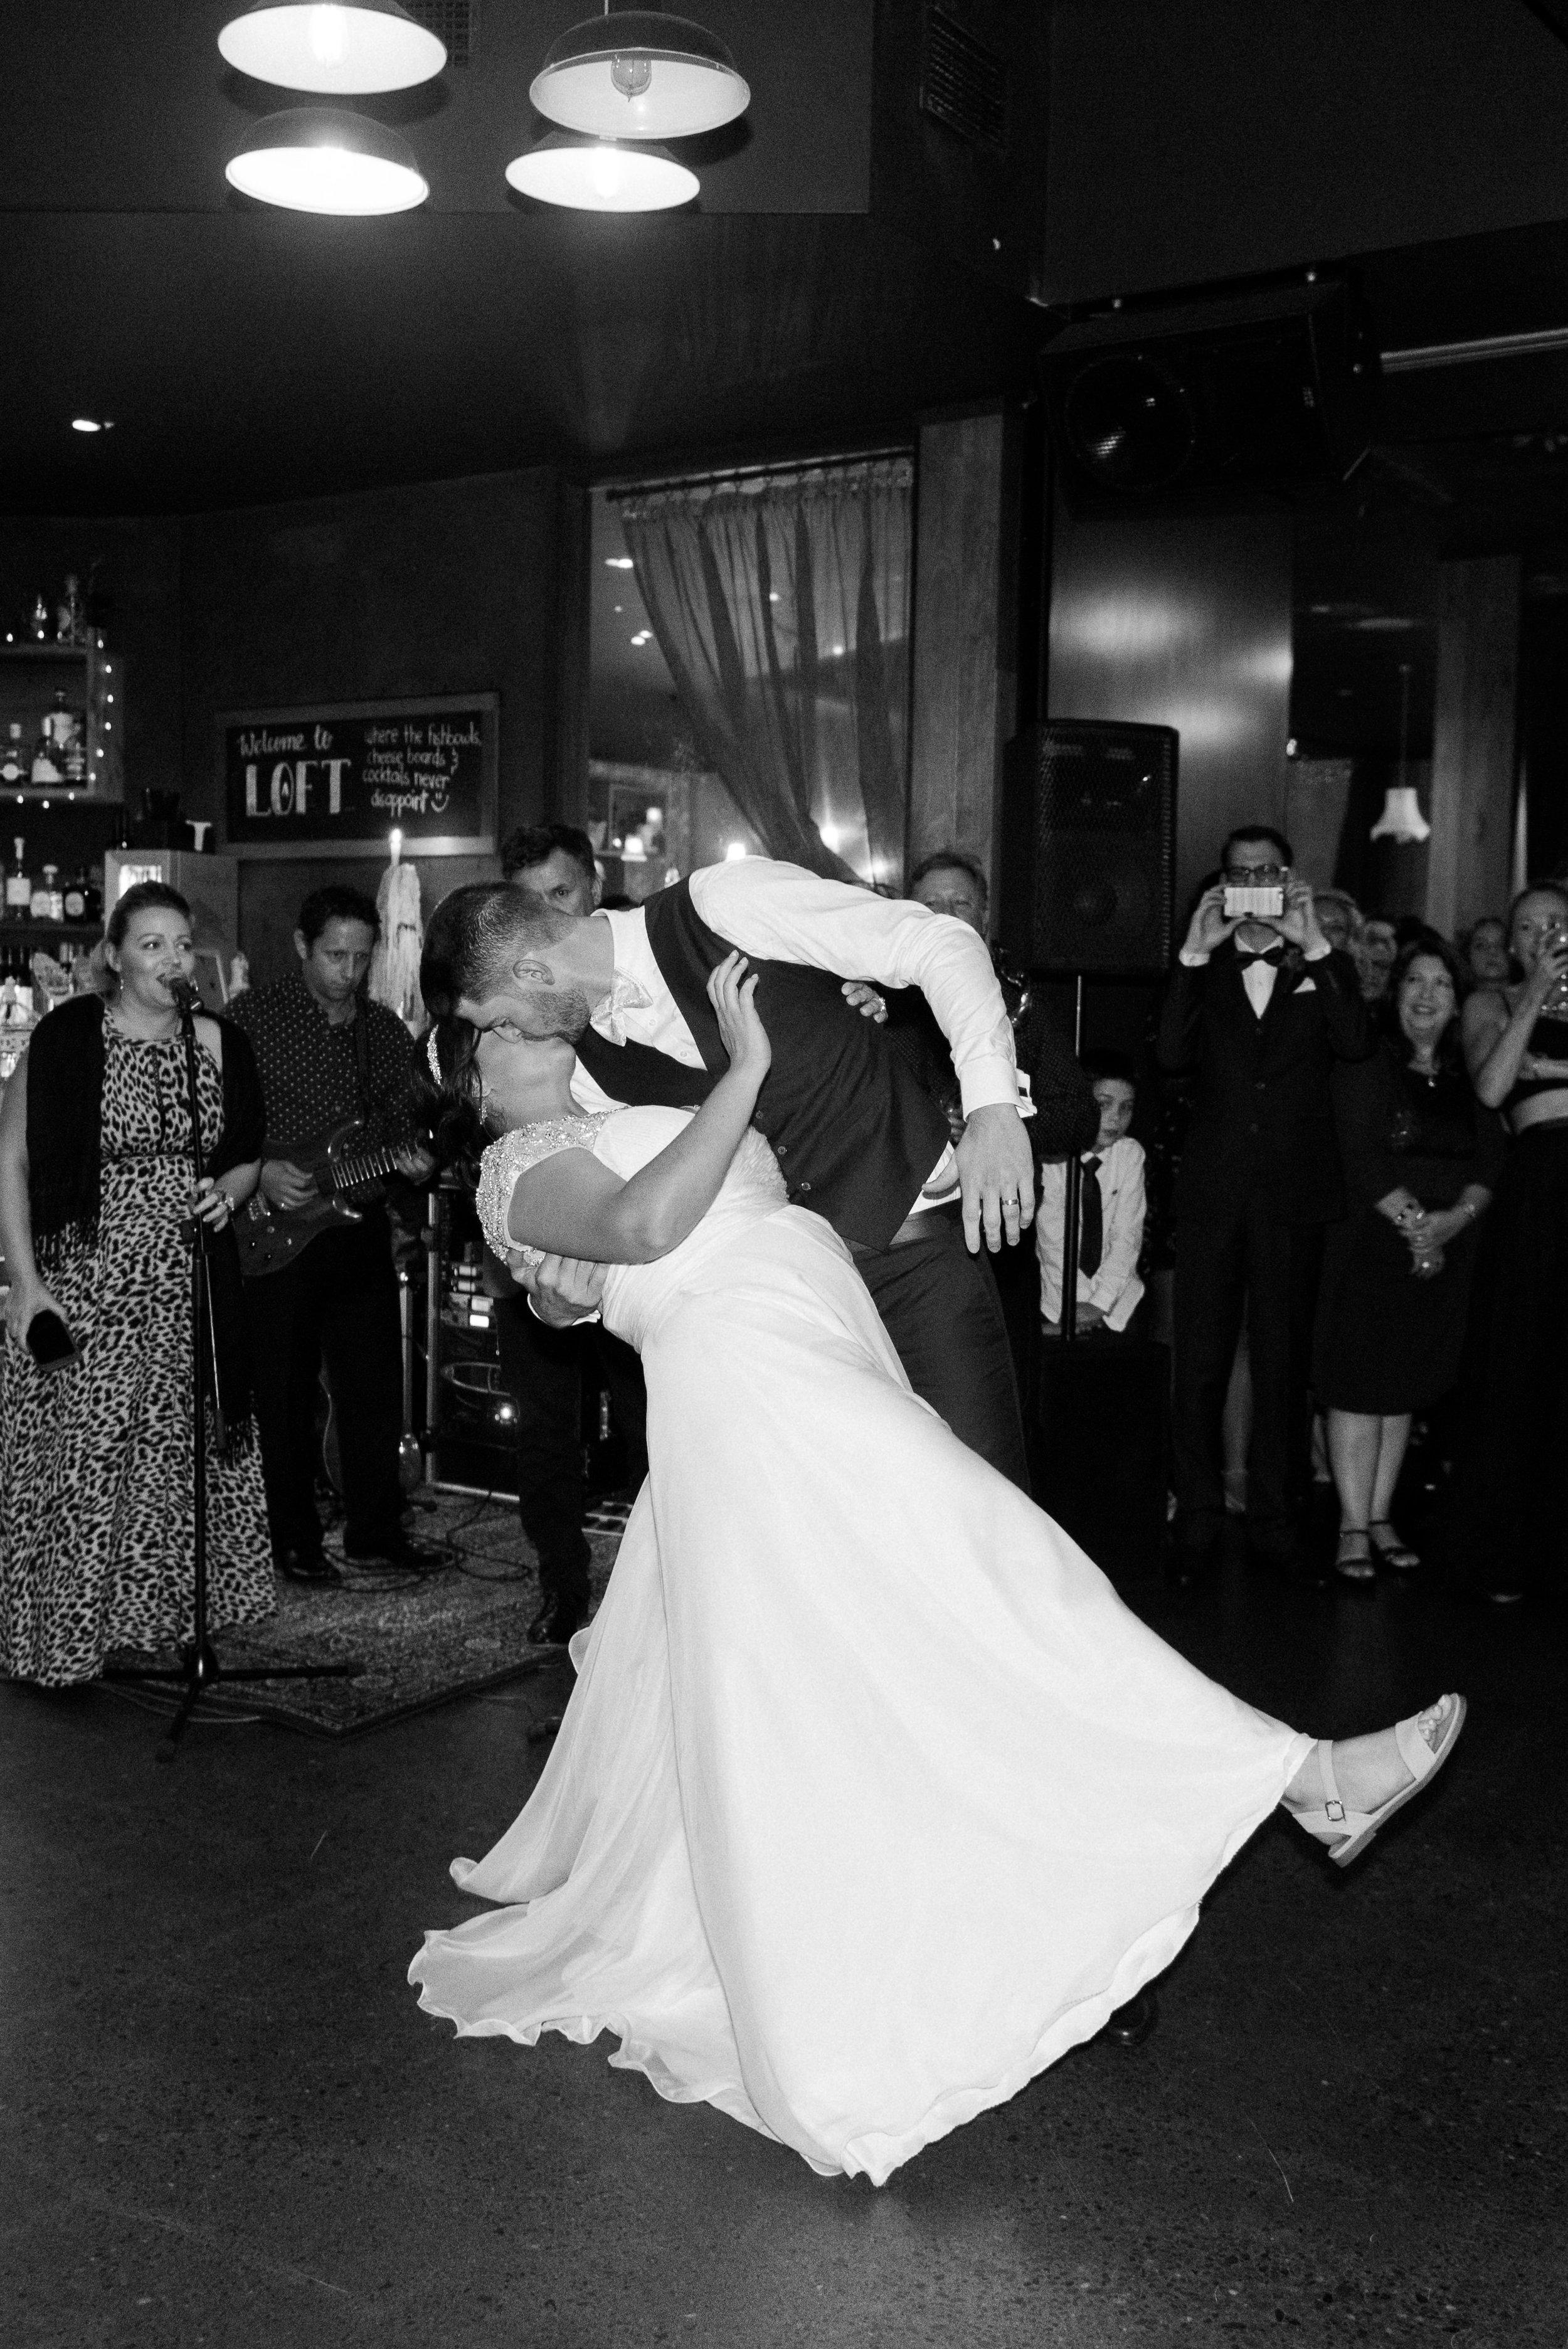 brisbane-city-wedding-photographer-loft-westend-21.jpg